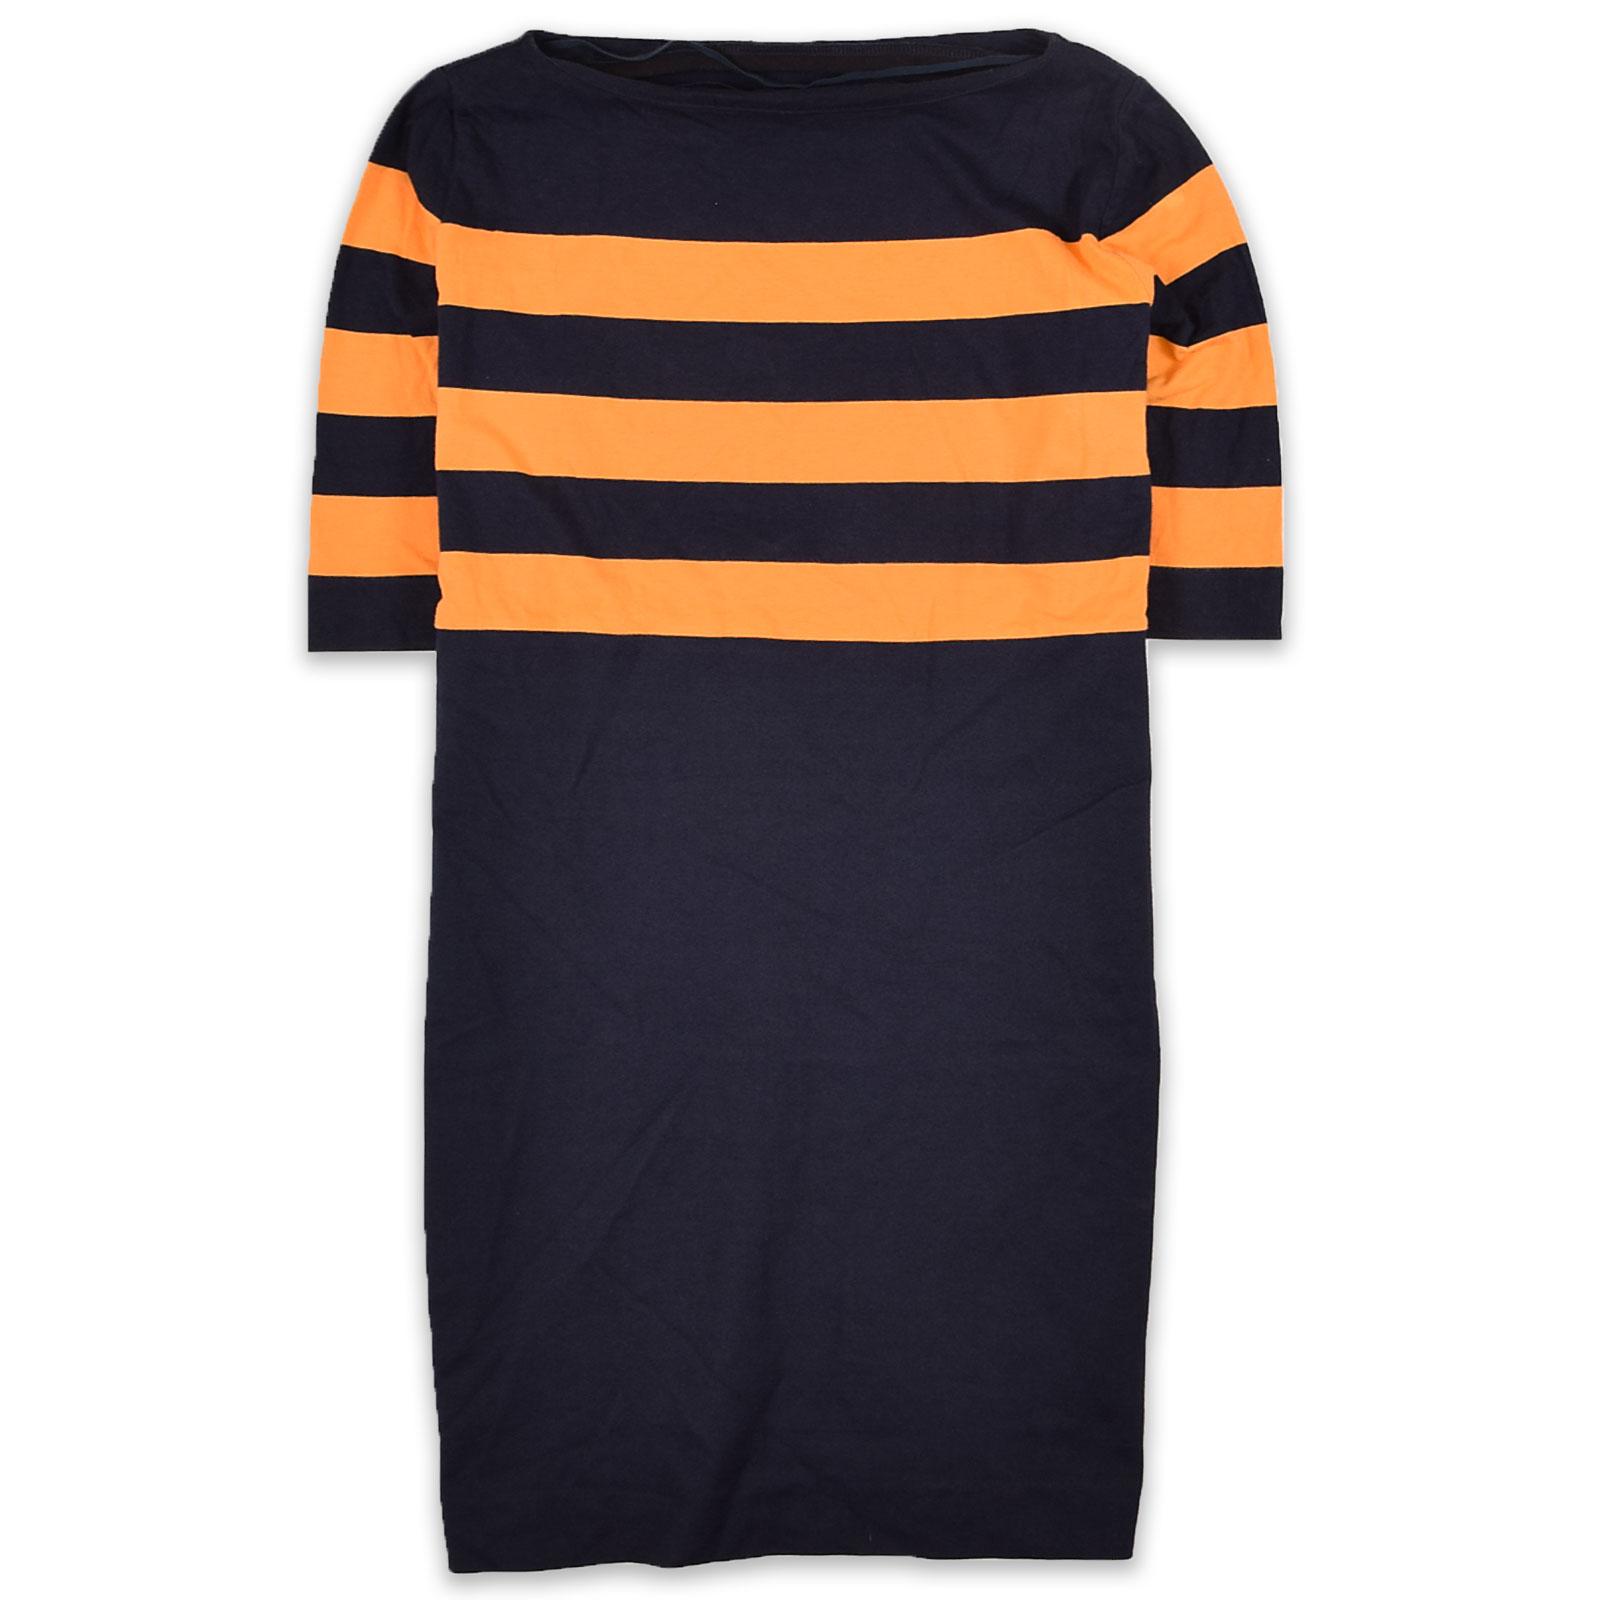 details zu cos damen kleid dress casual freizeit gr.s (de 36) tunika  mehrfarbig 97708